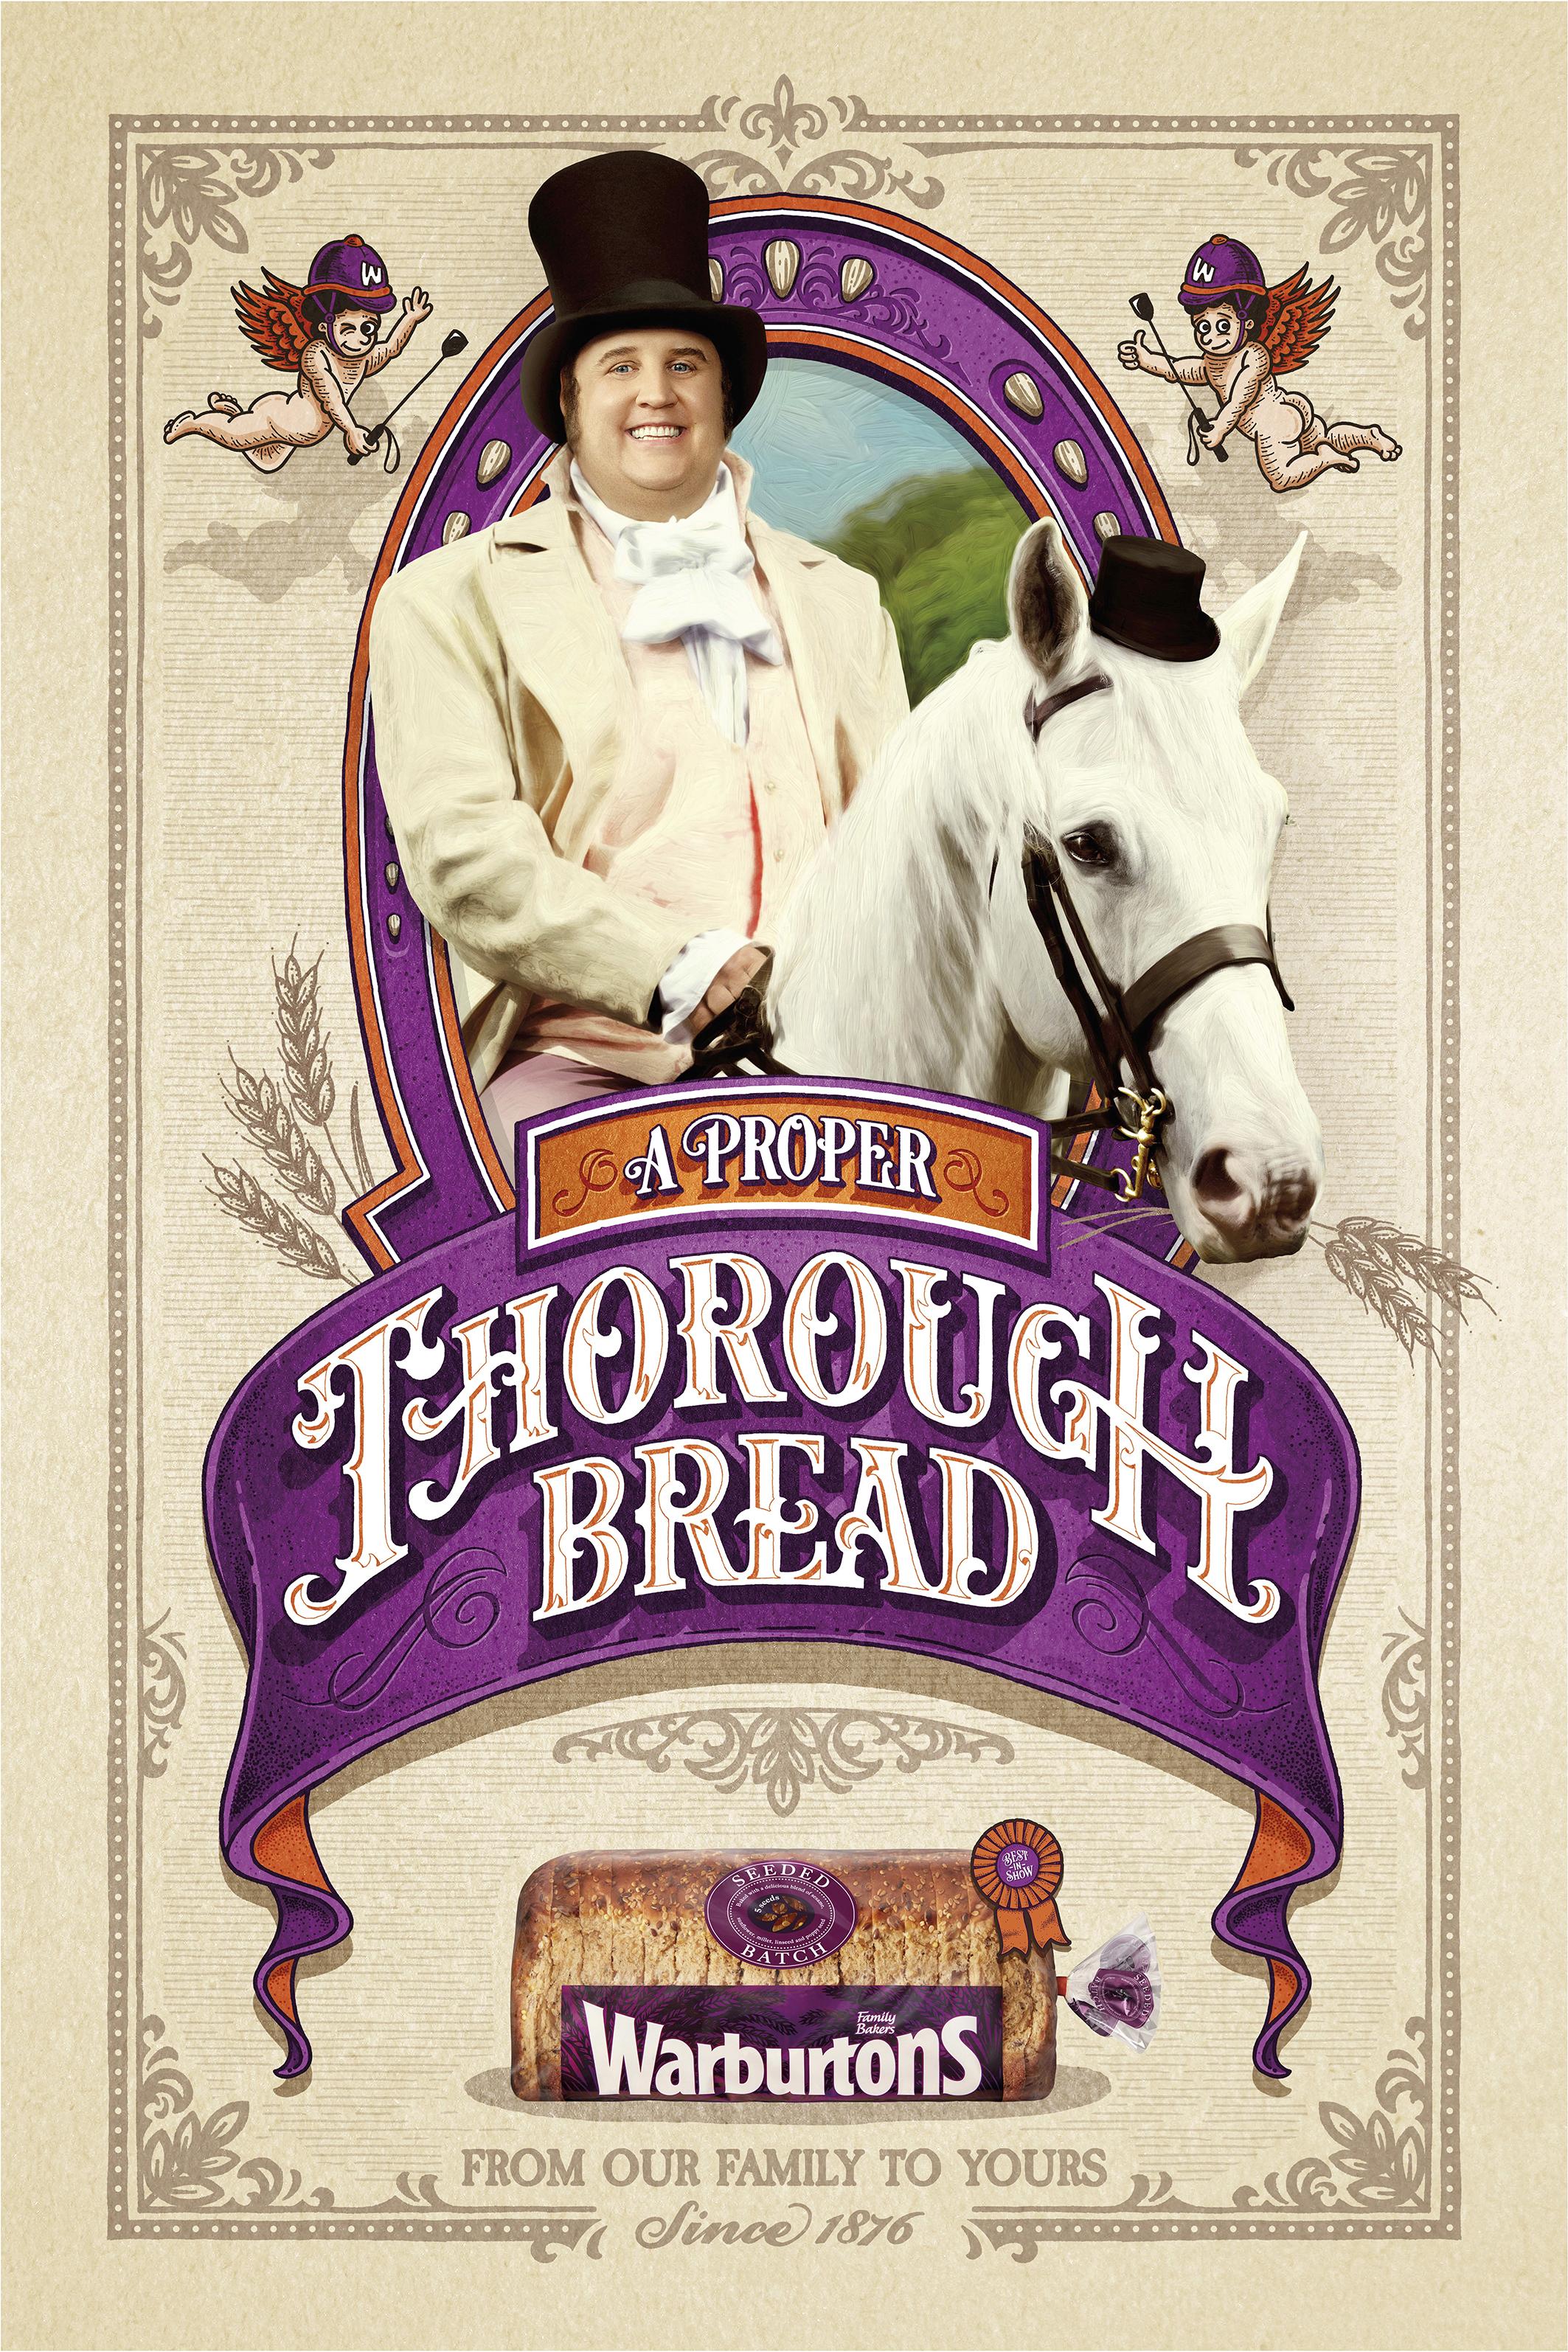 SMALLthorough bread.jpg